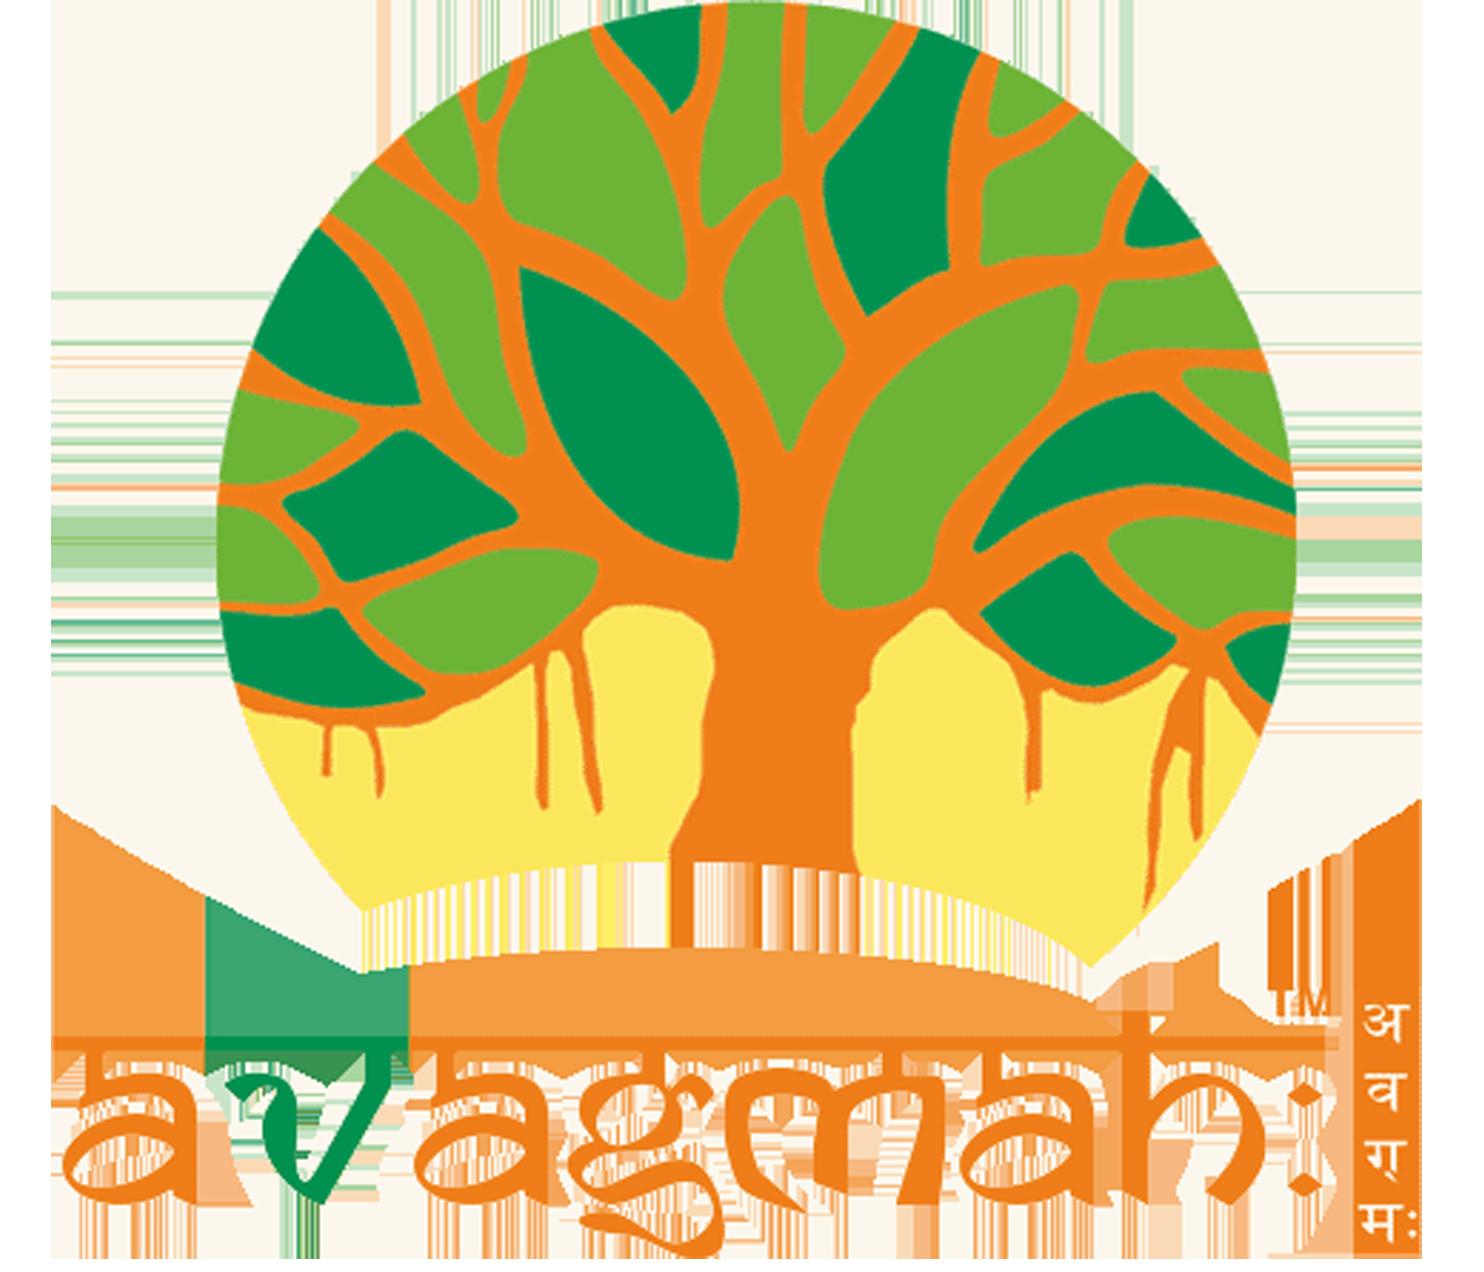 Engineering clipart tech ed. Startup avagmah raises fund